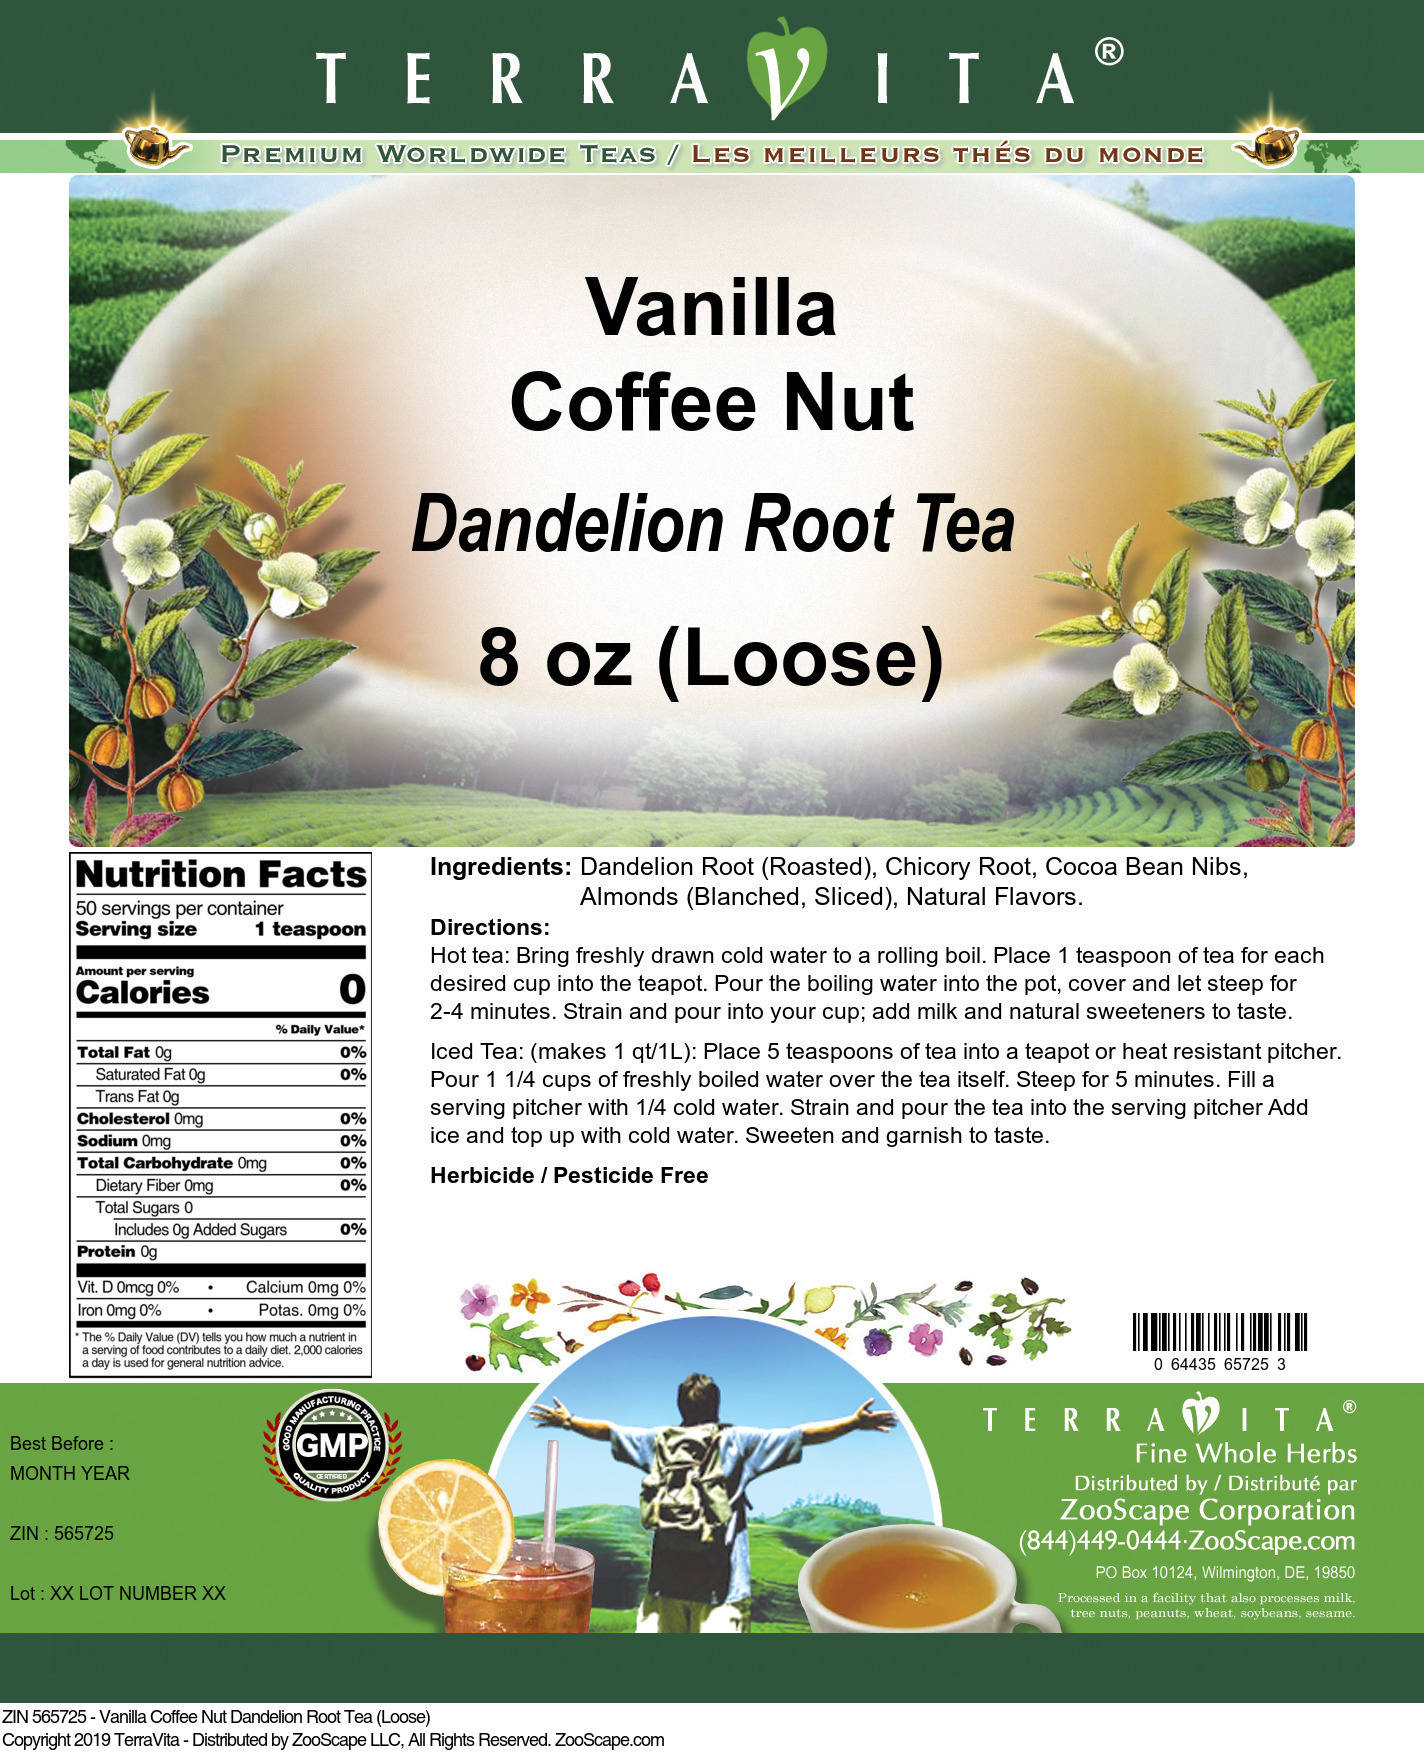 Vanilla Coffee Nut Dandelion Root